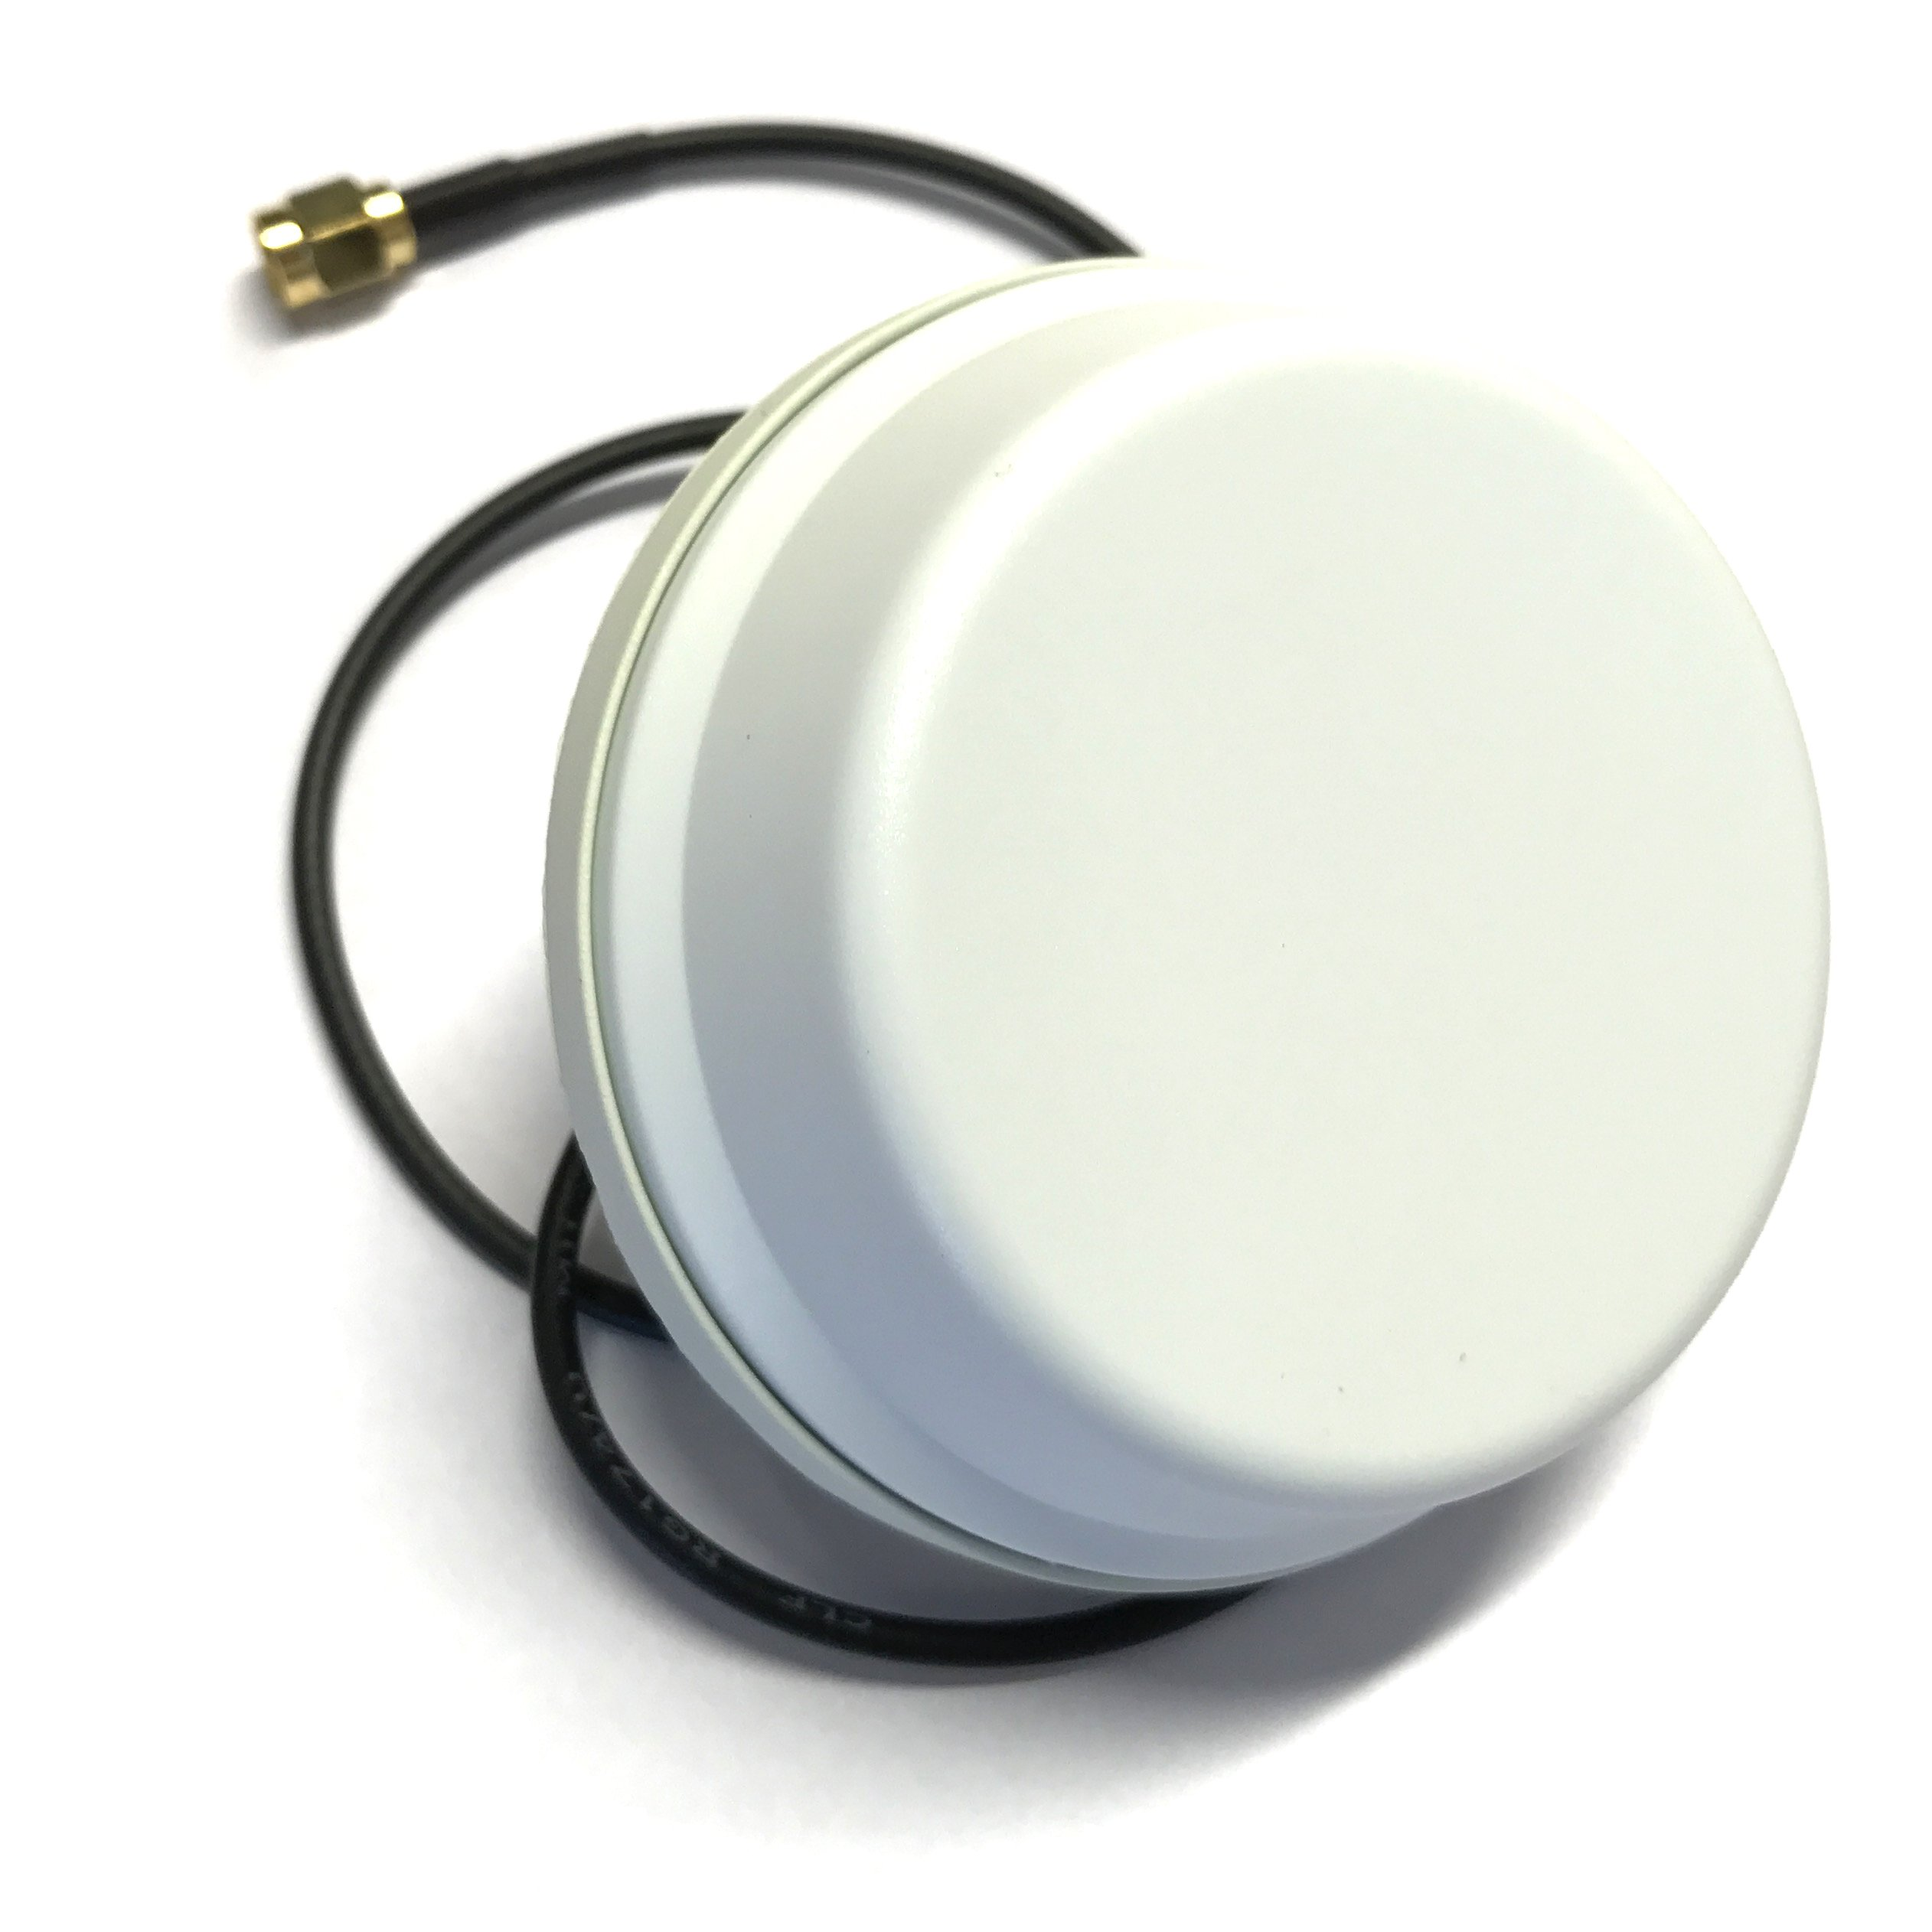 QA42v 3G/4G/Lte kompakt antenn för takmontering